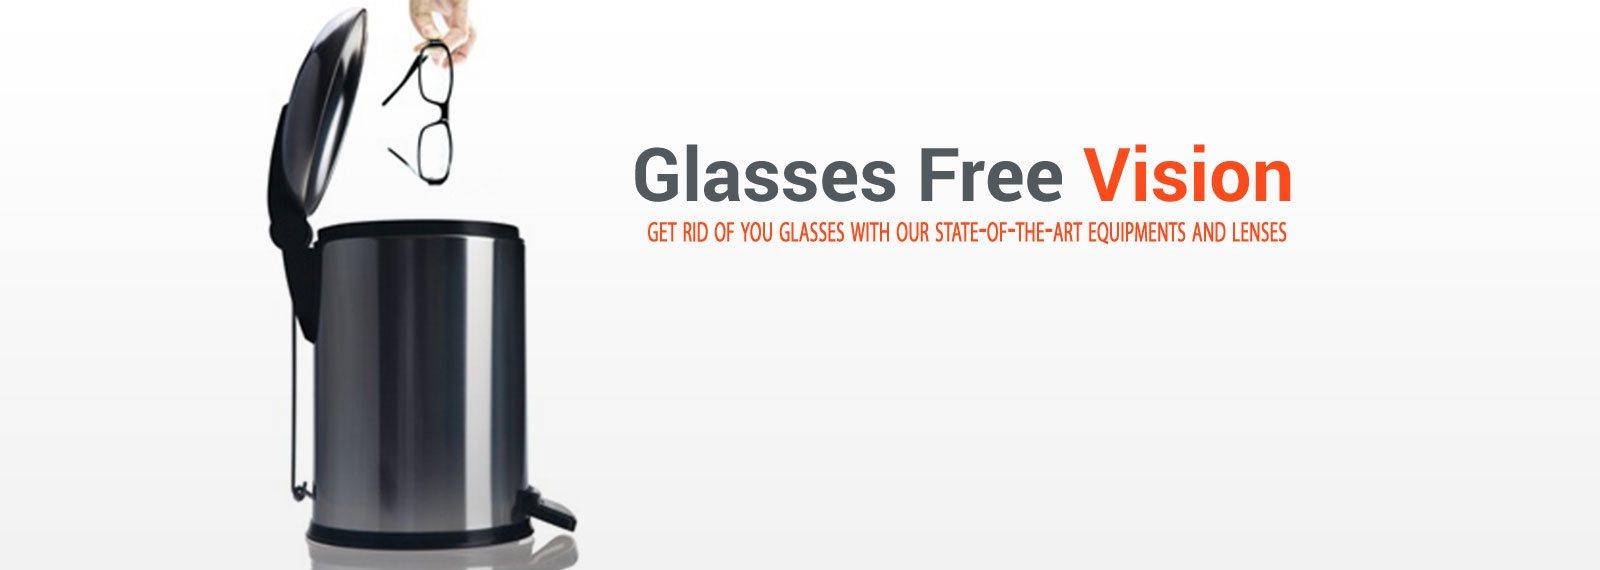 Glasses Free Vision